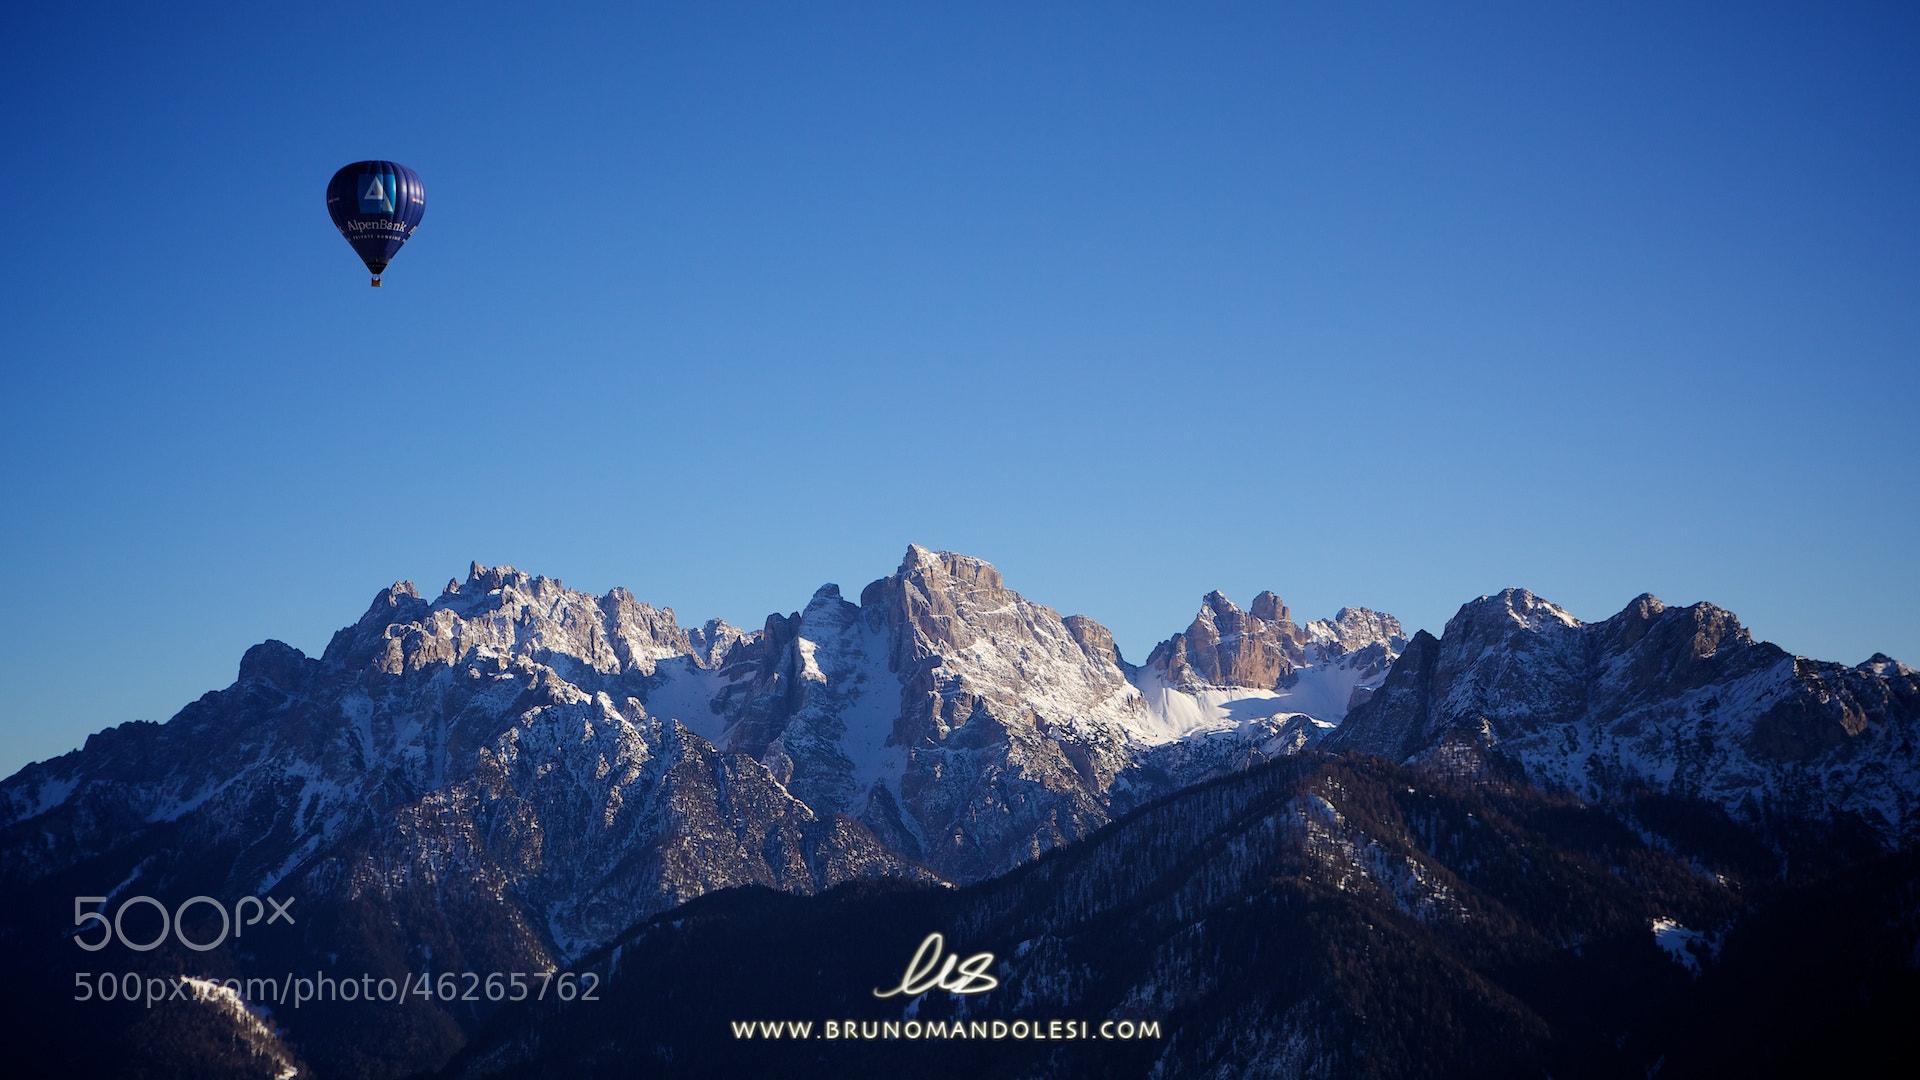 Photograph Flying high by bruno mandolesi on 500px